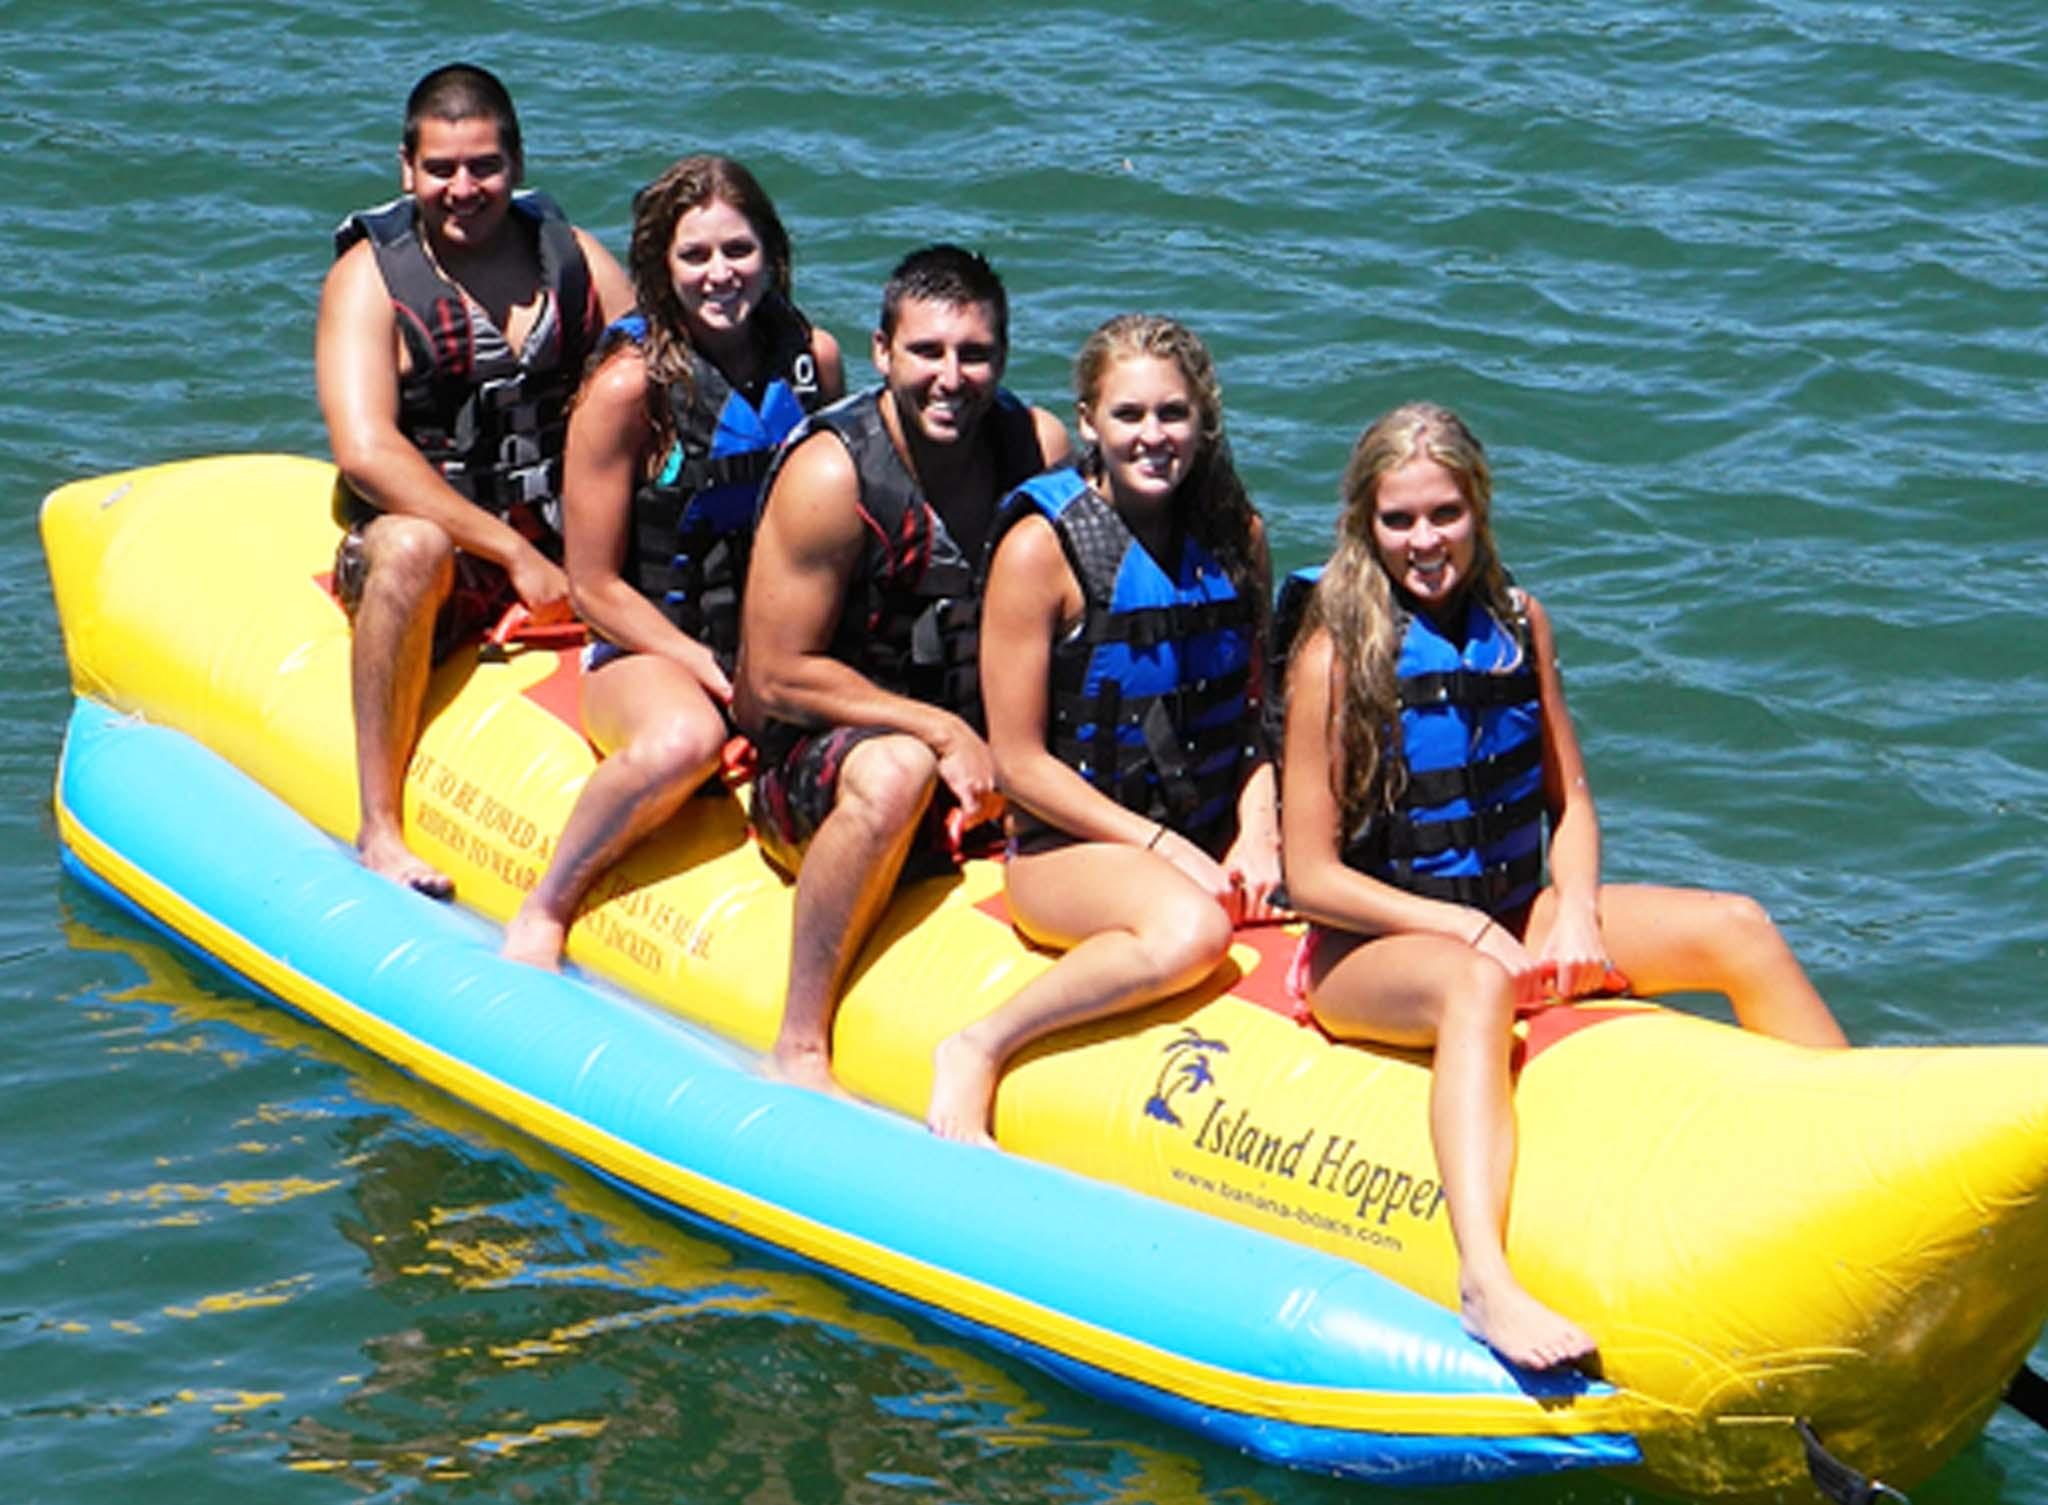 Deportes Acuaticos Sitges Banana Boat 1